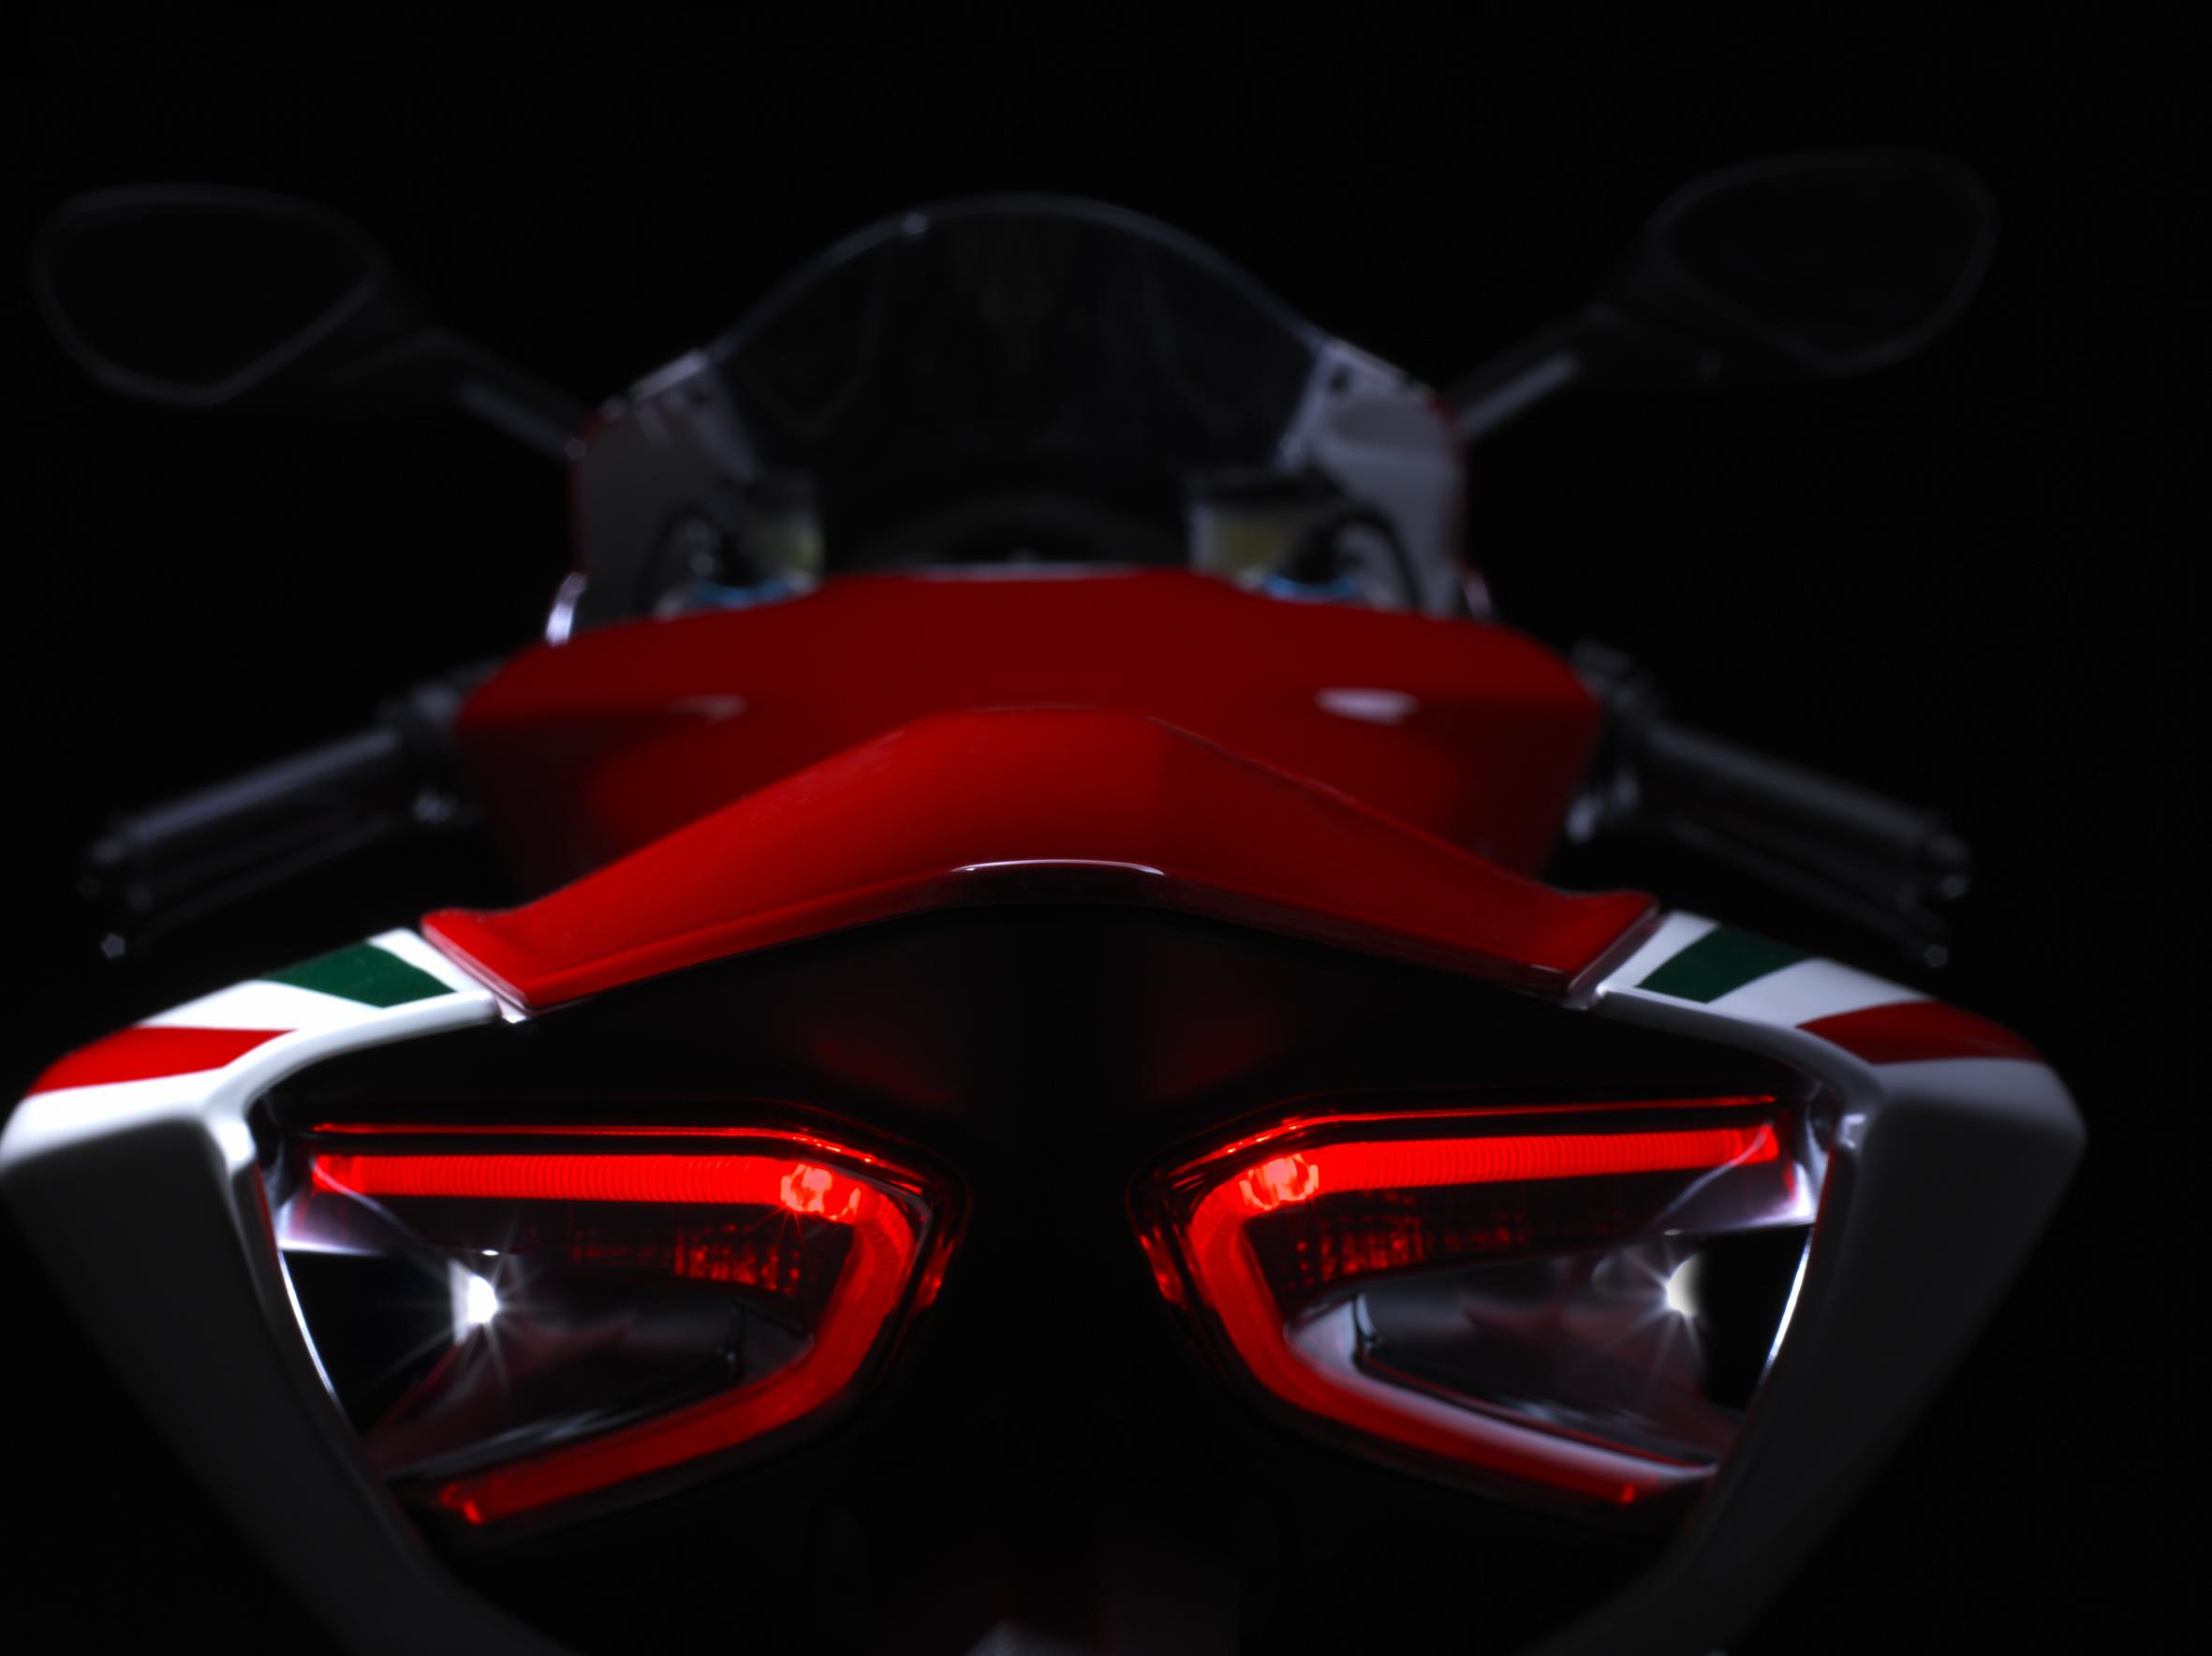 superbike_1199_panigale_s_tricolore_21